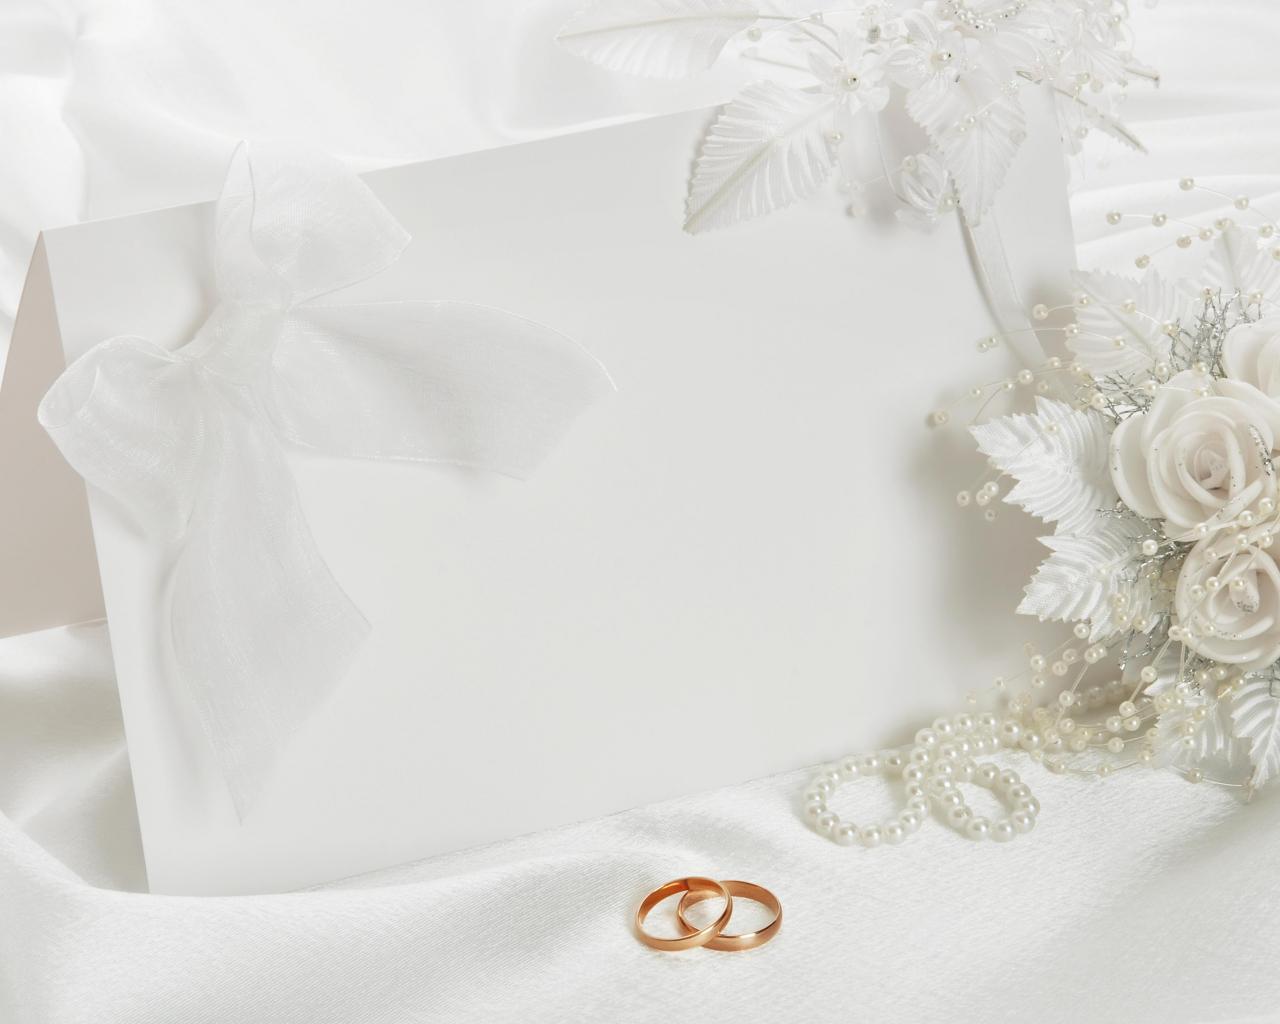 Free Wedding Invitation Background Images: Elegant Wedding Wallpaper